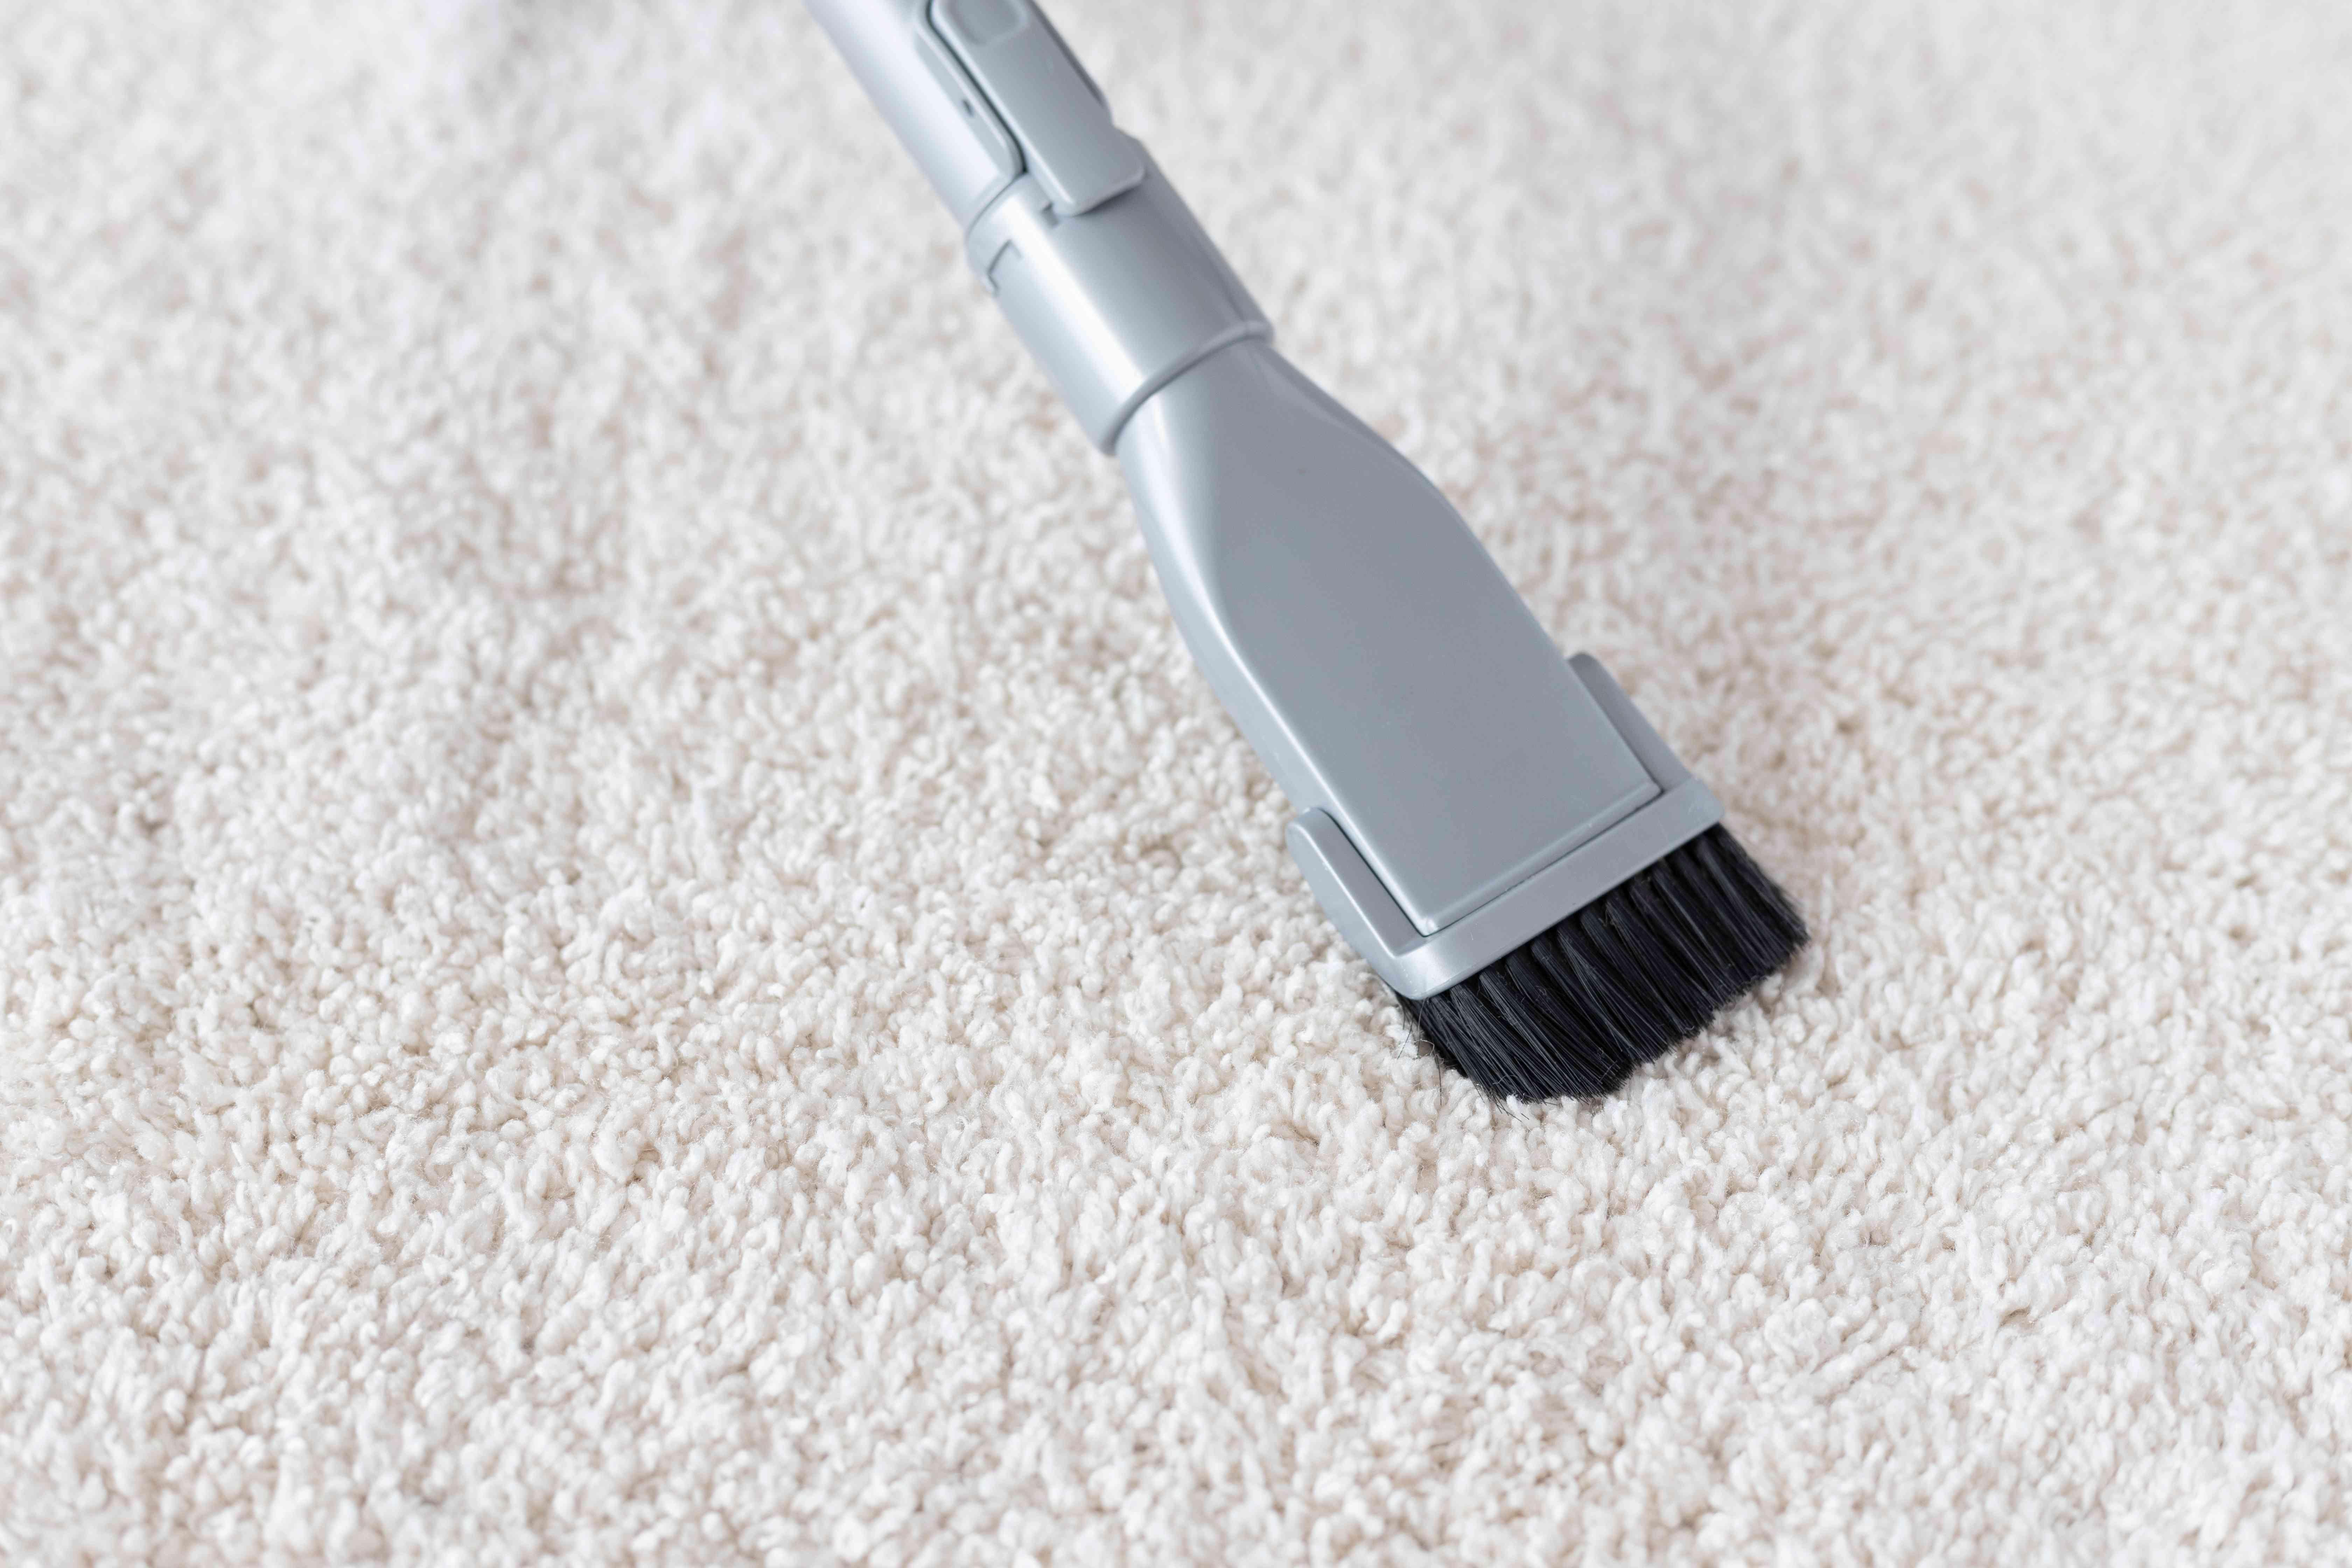 Vacuum lifting clean fibers